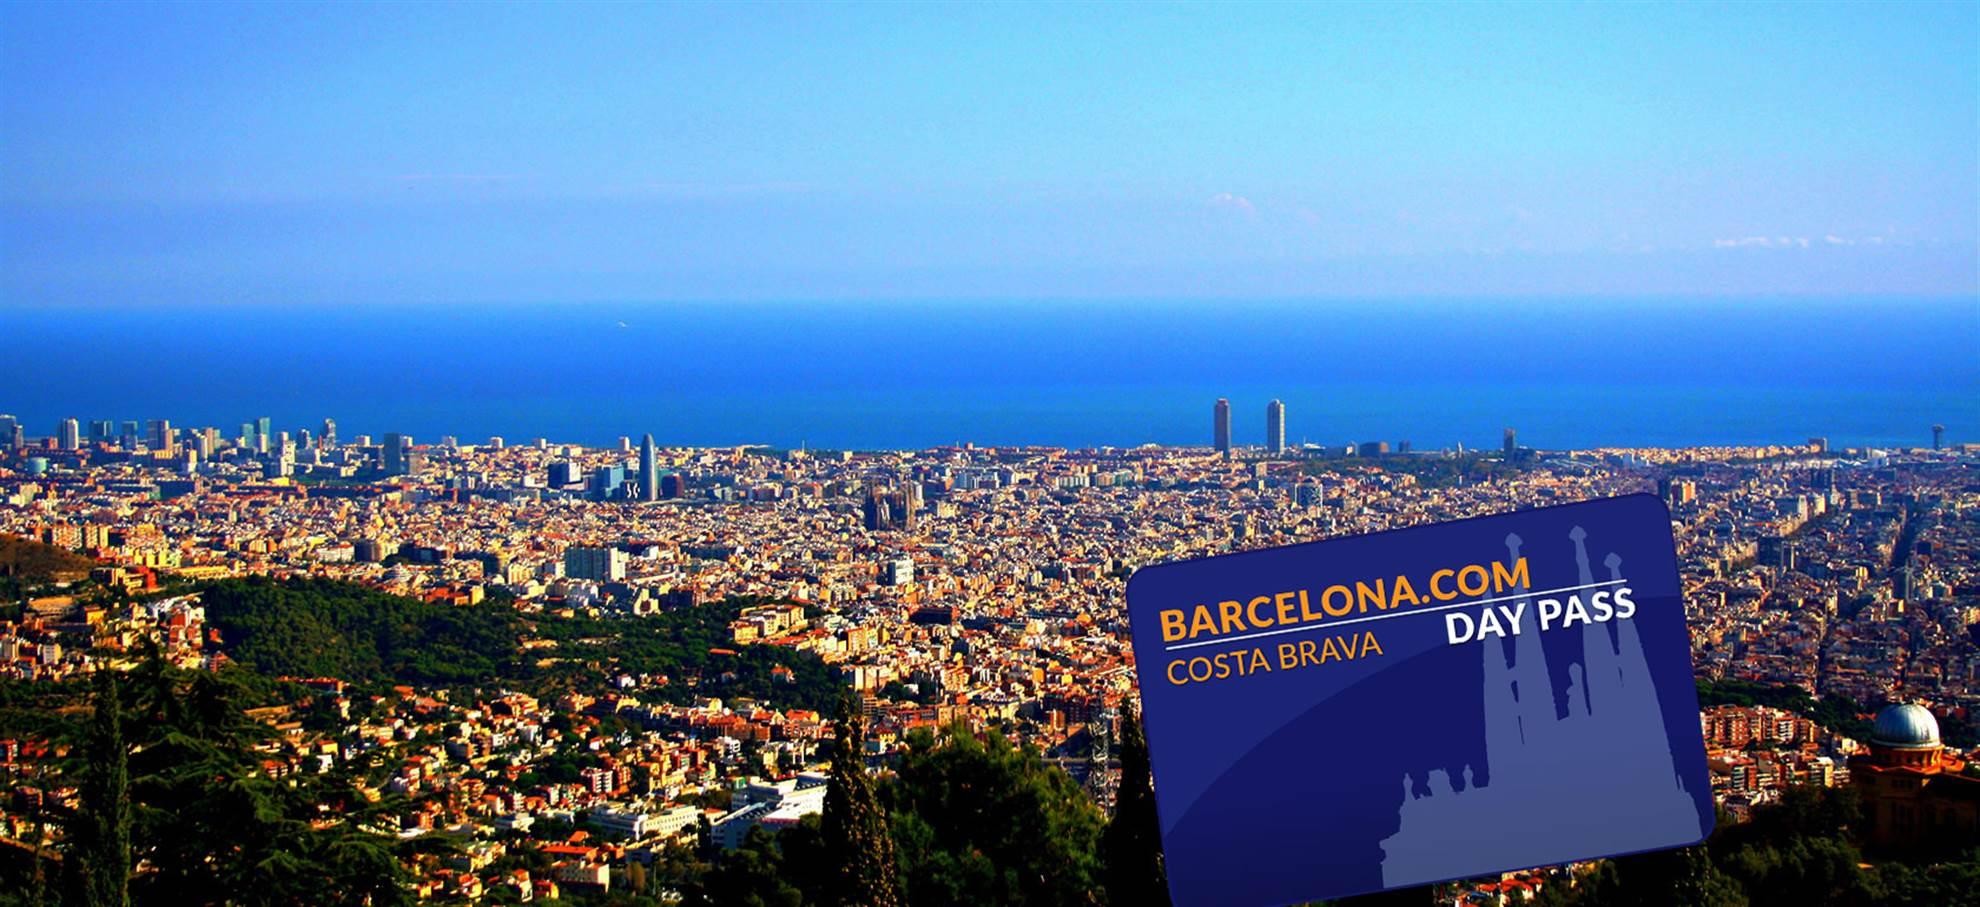 Costa Brava – Barcelona.com Day Pass